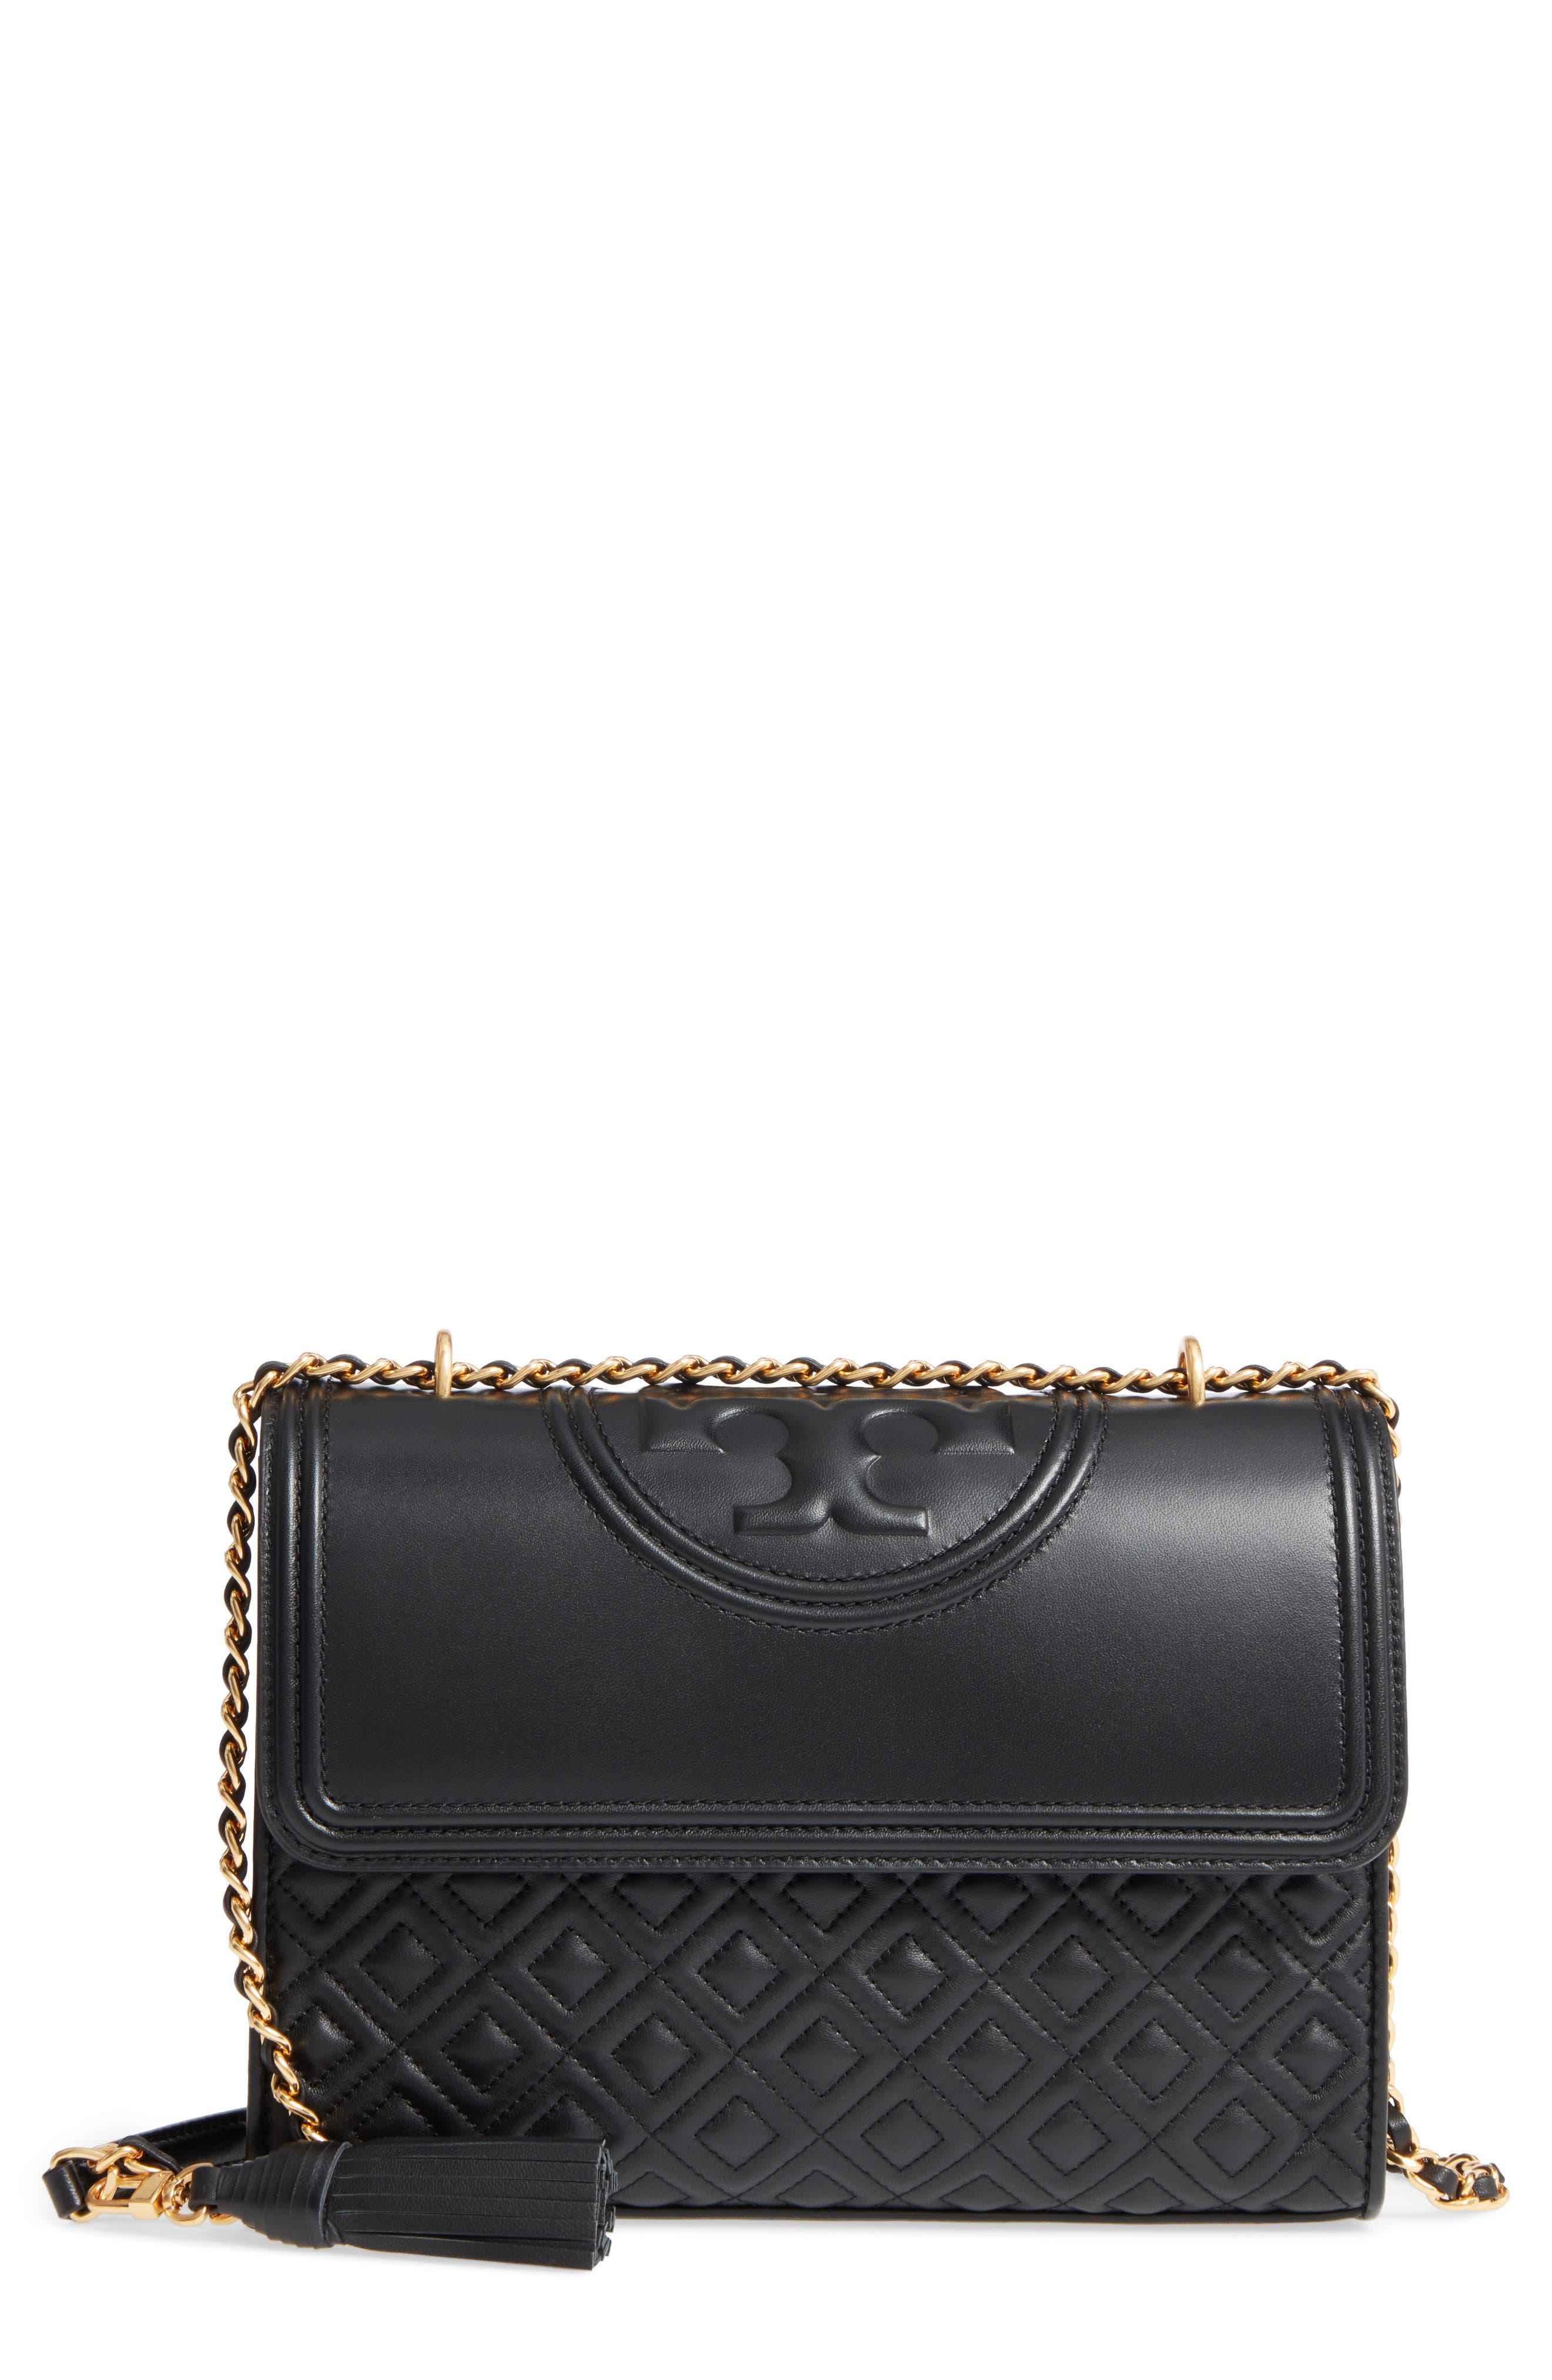 Fleming Leather Convertible Shoulder Bag,                             Main thumbnail 1, color,                             BLACK